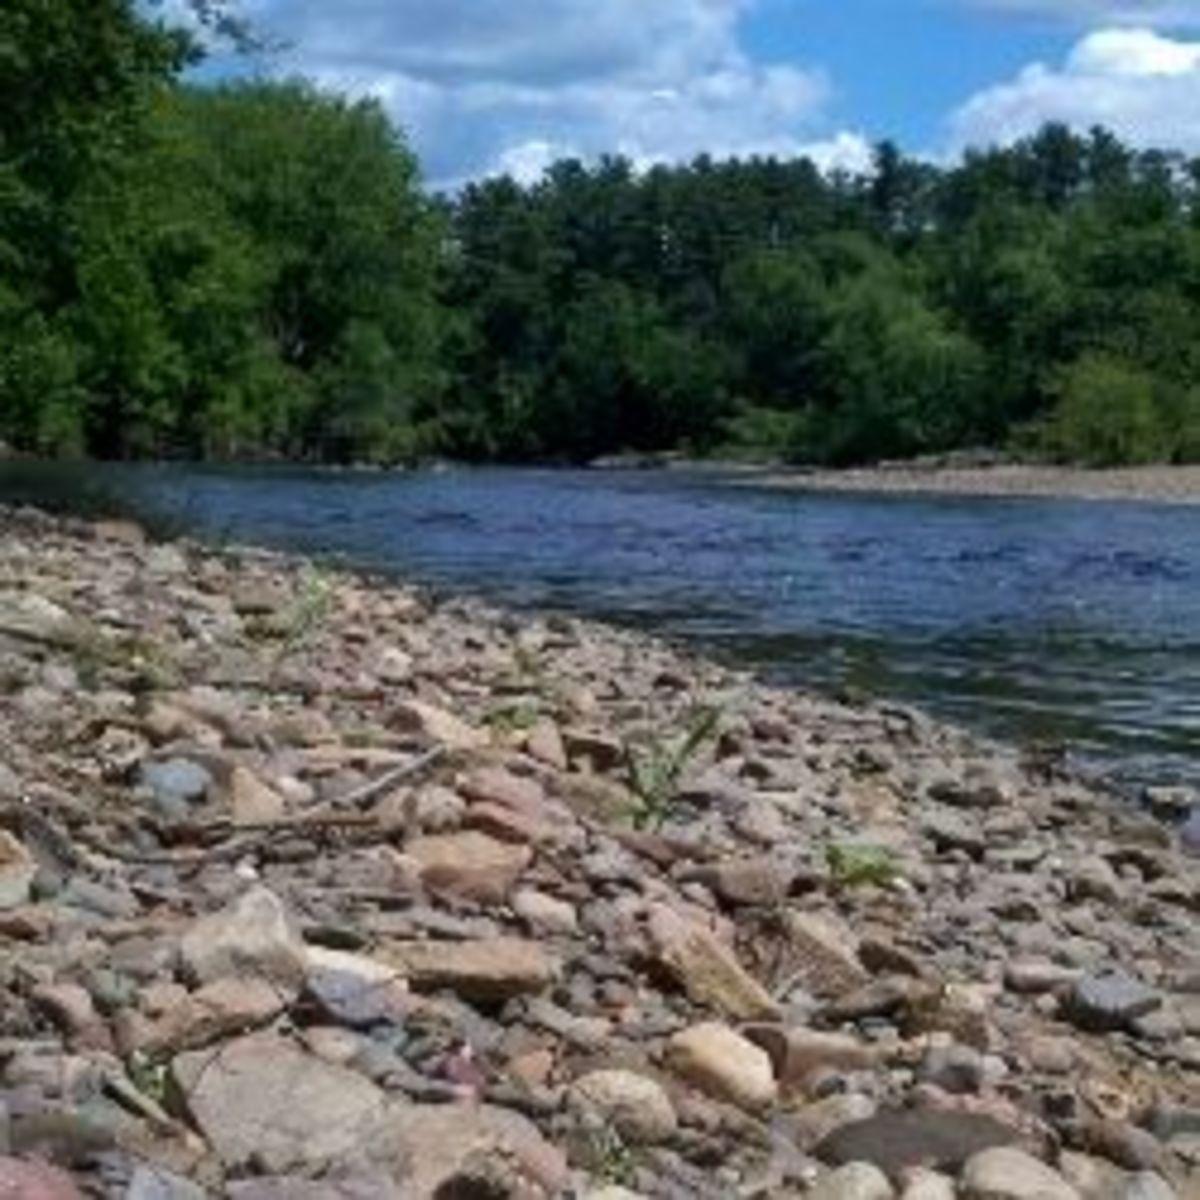 DIY River Stone Necklace for Amateur Rockhounds